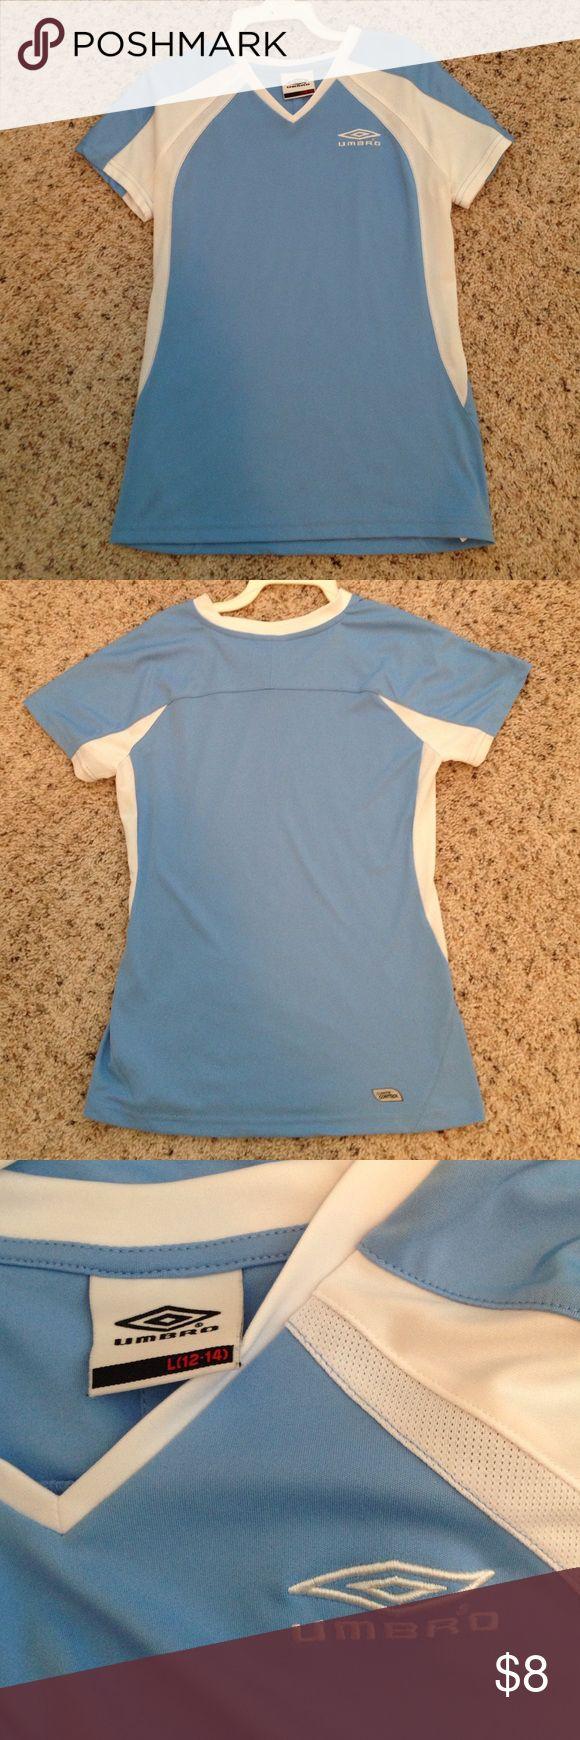 Umbro shirt Light blue and white Umbro shirt. Kids size large (12-14), like new condition Umbro Shirts & Tops Tees - Short Sleeve